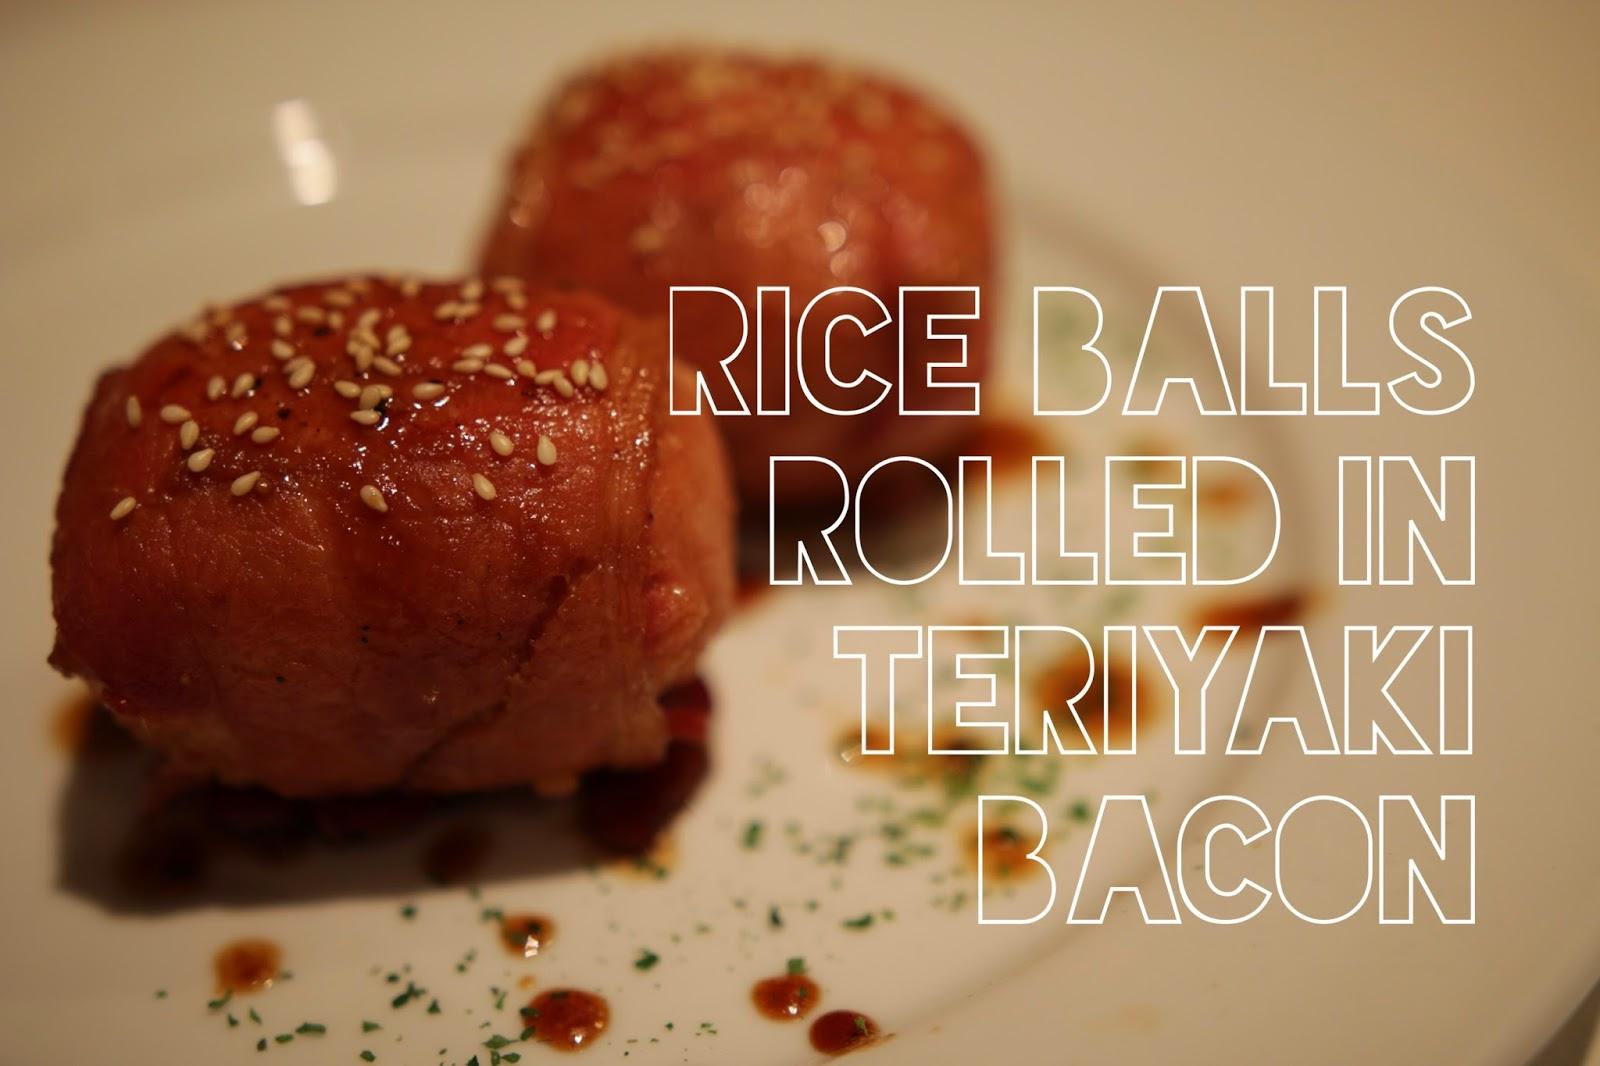 Rice balls rolled in teriyaki bacon